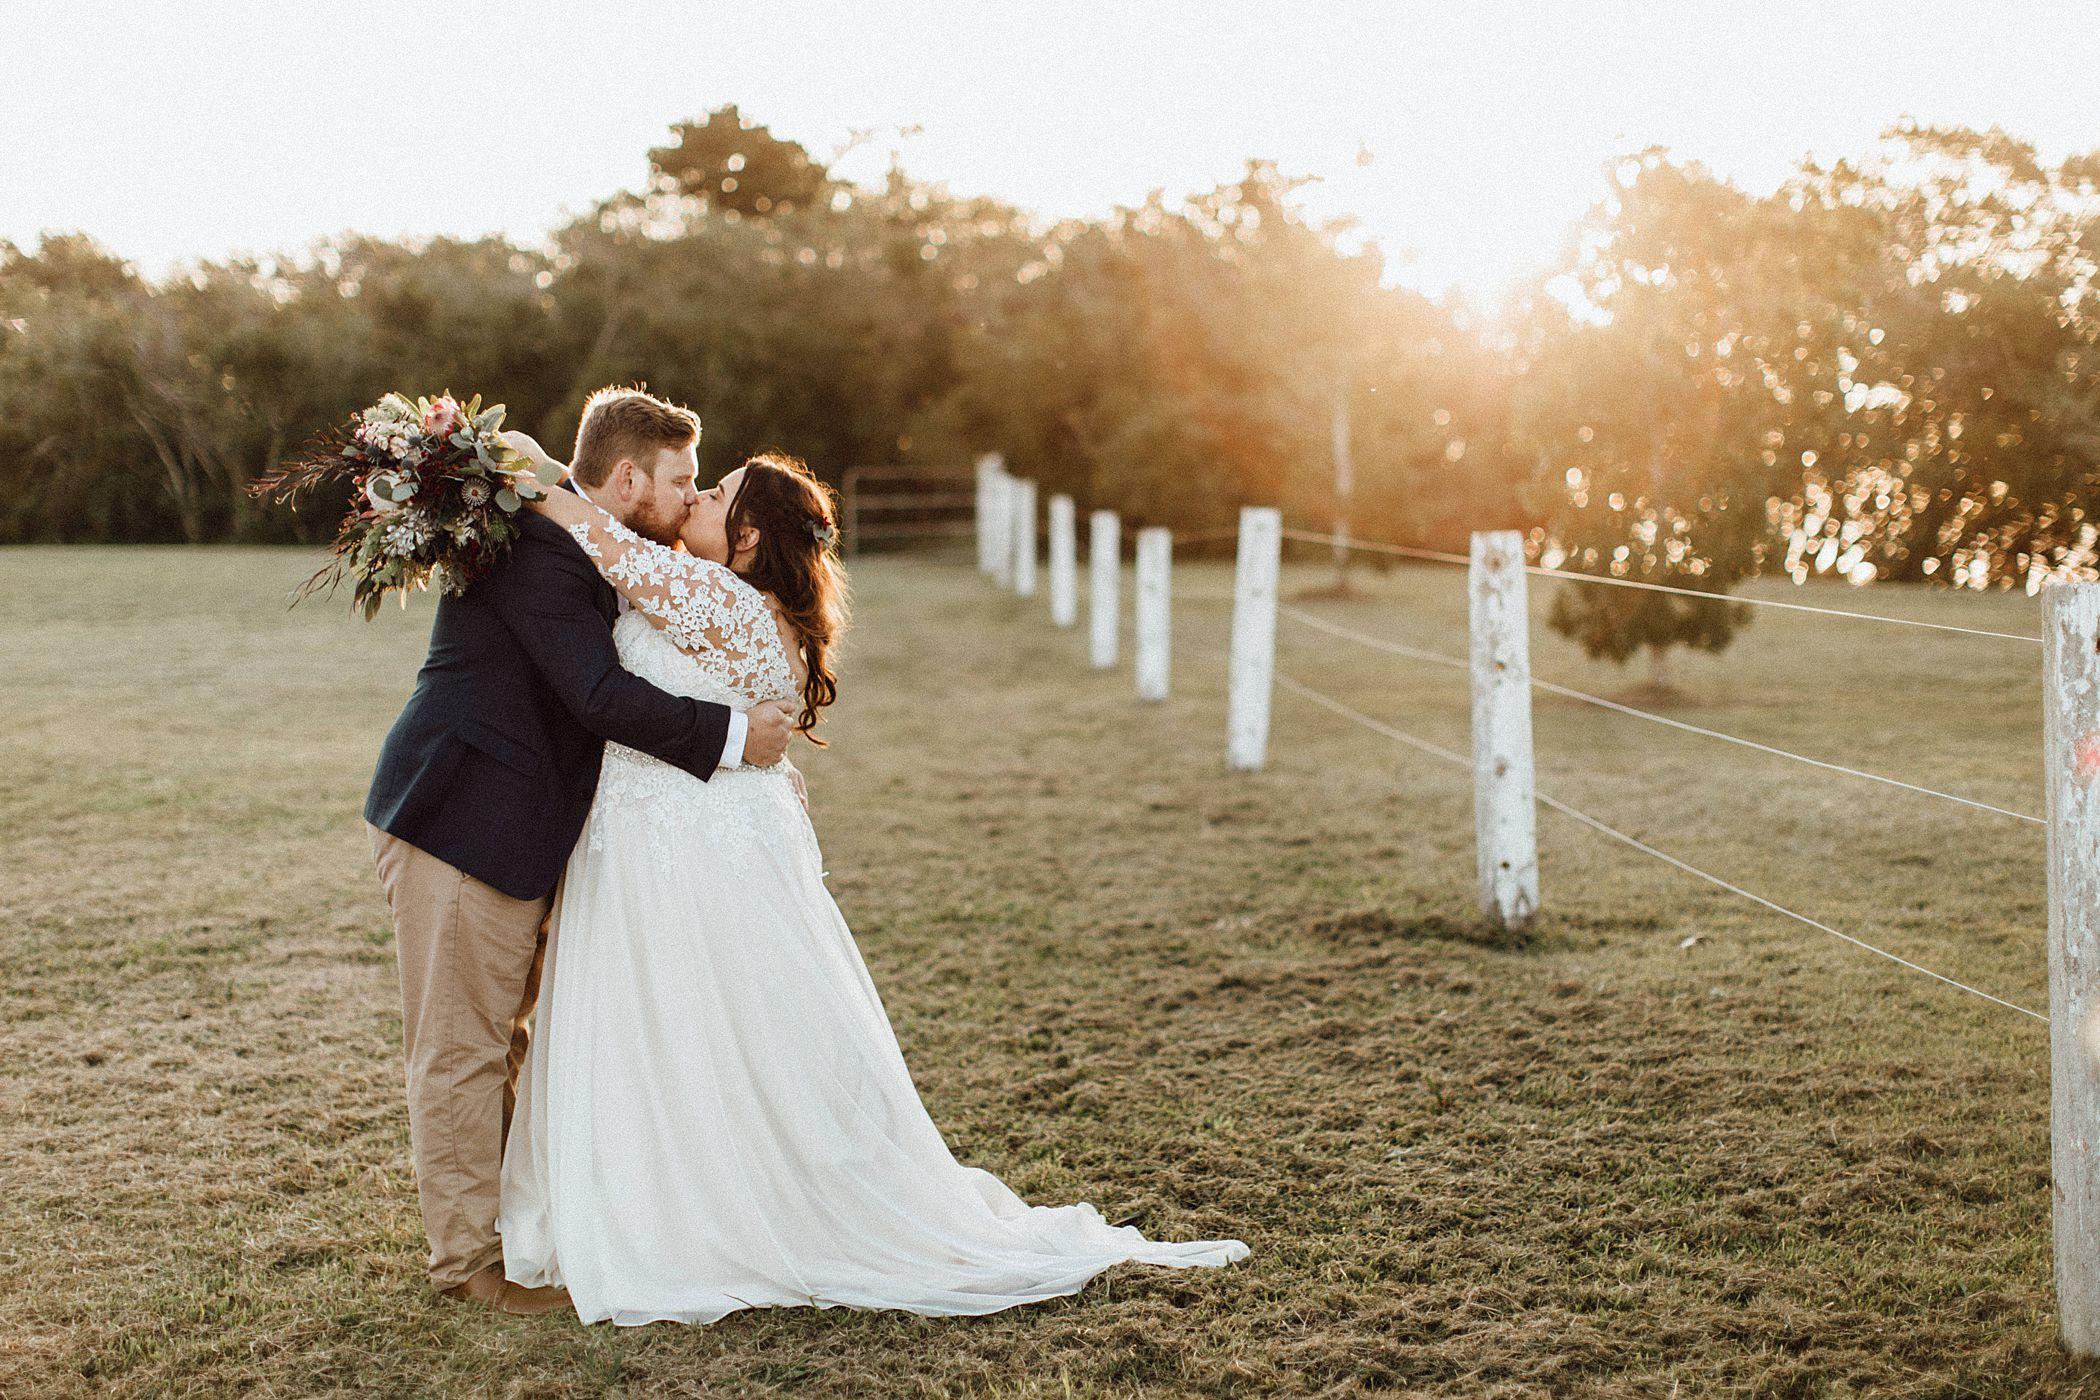 lauren-anne-photography-newcastle-hunter-valley-wedding-photographer_1211.jpg